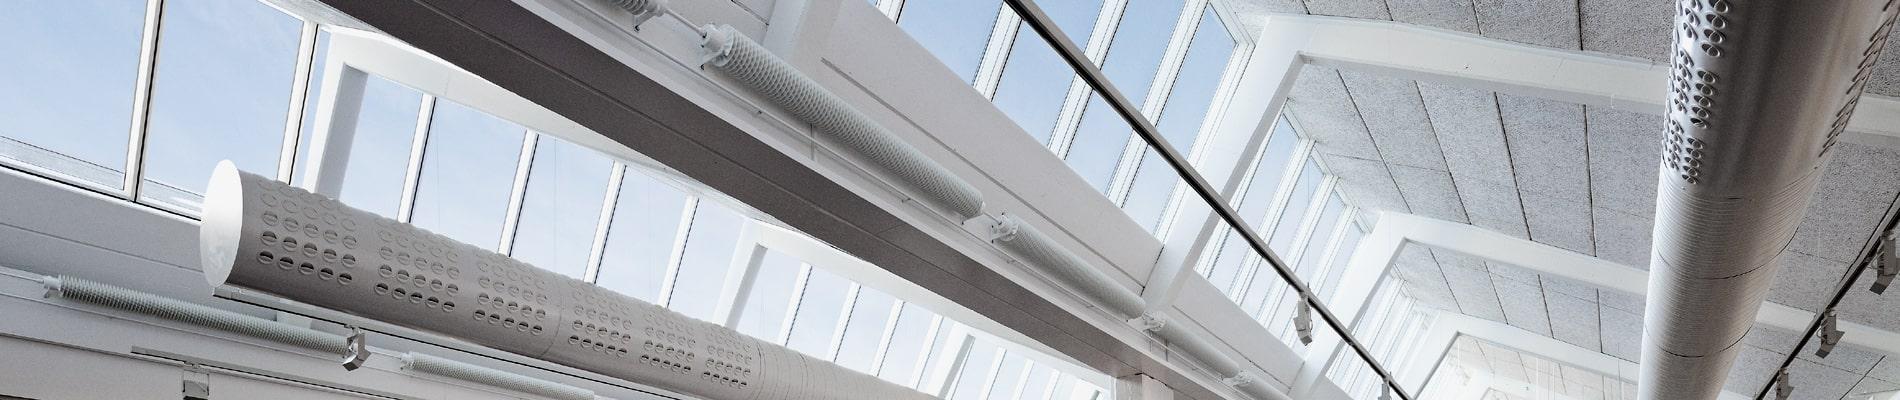 VELUX Modular Skylight Sheddach-Lichtband